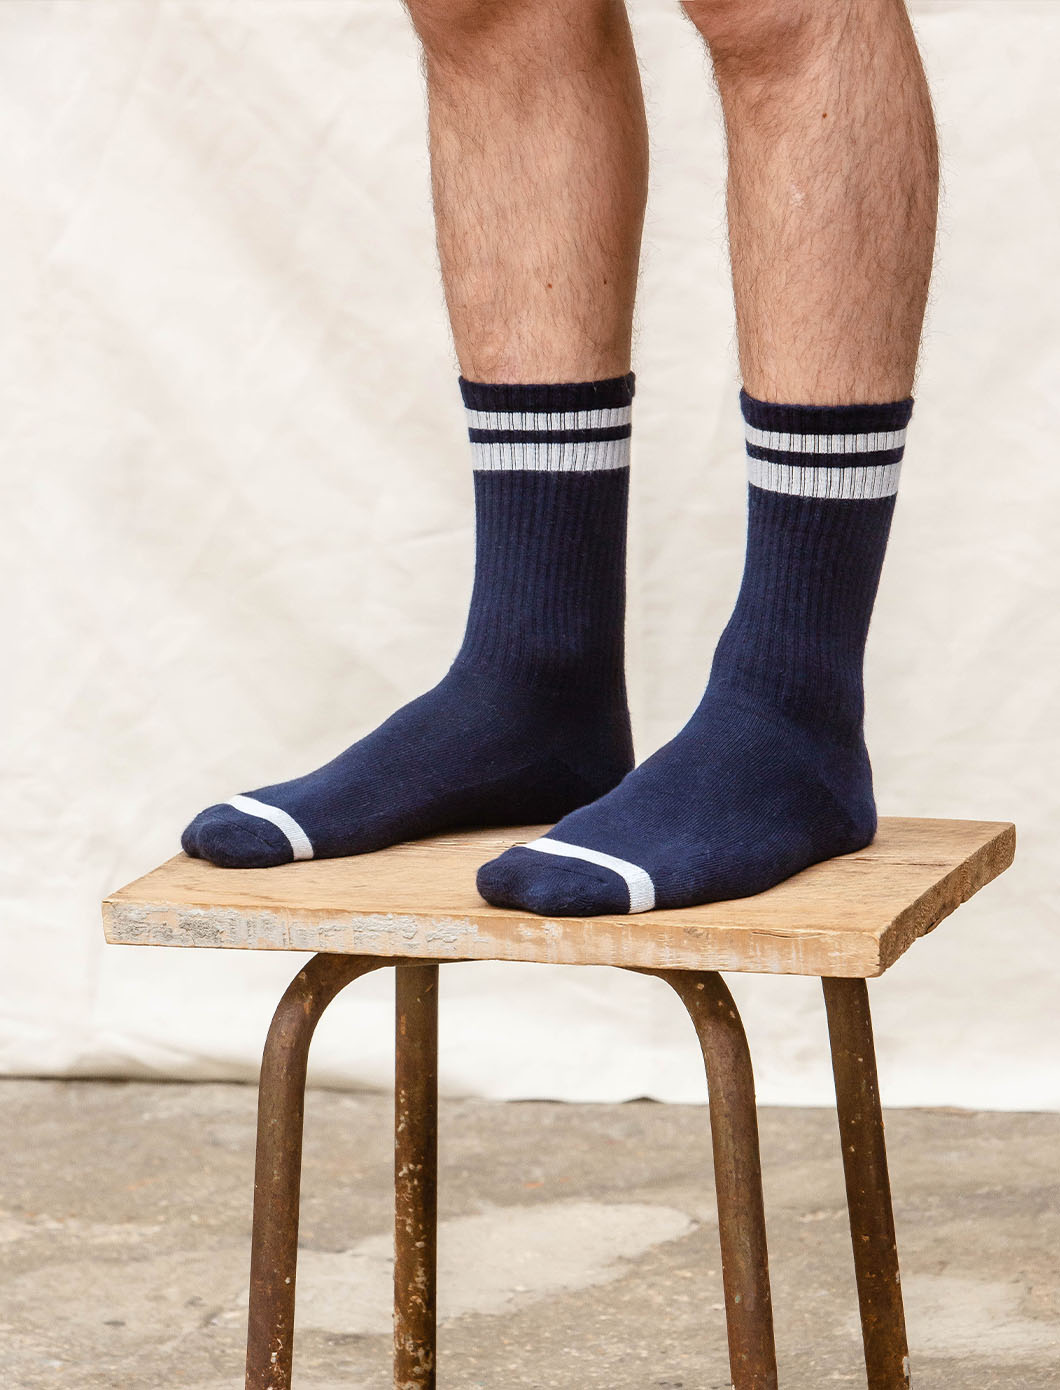 Ribbed Sport Socks - Navy & White